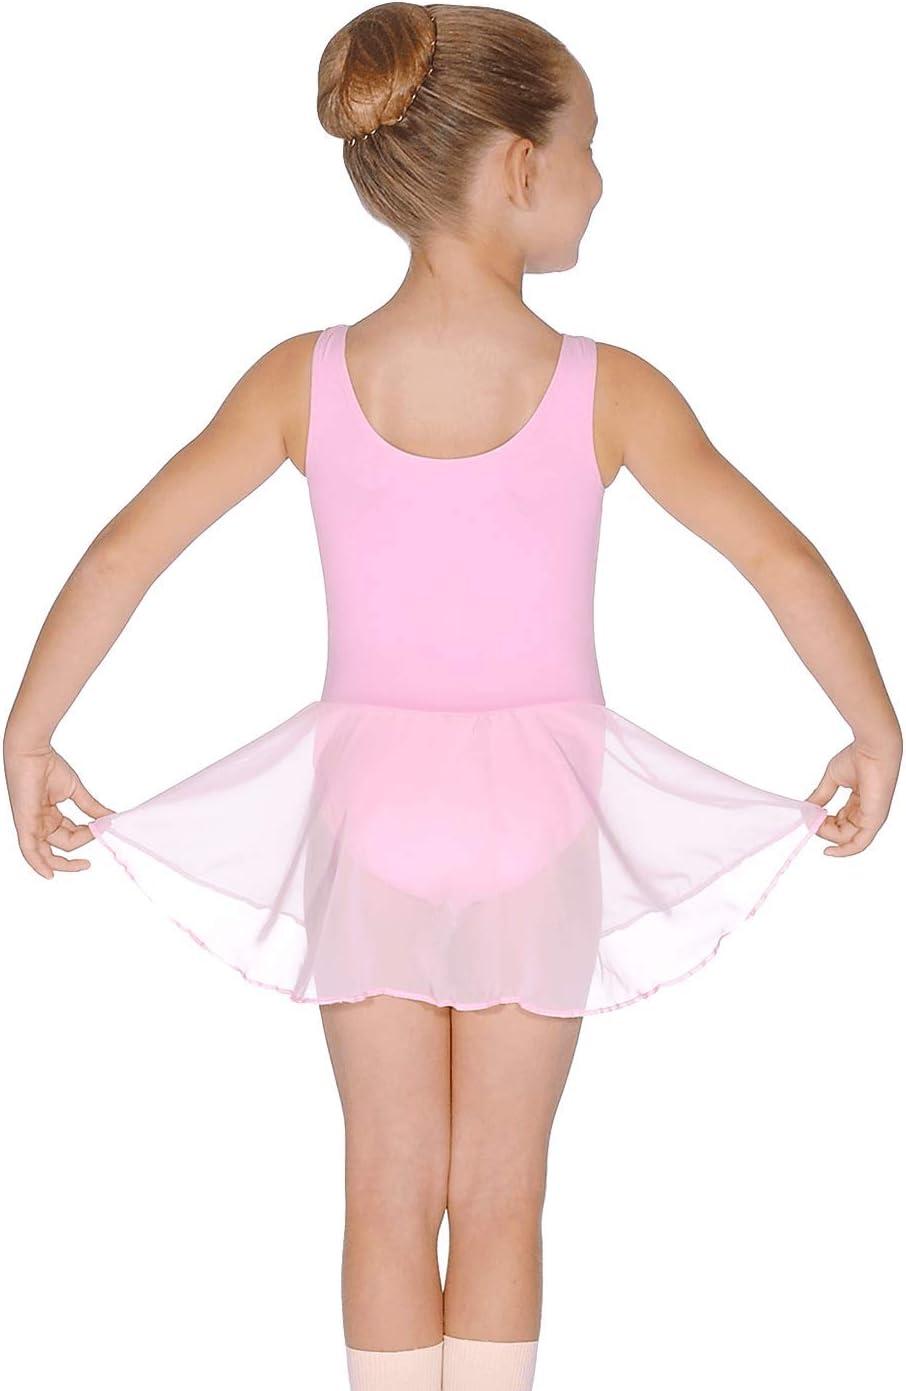 Roch Valley RVCharlotte Microfibre Sleeveless Leotard with Skirt